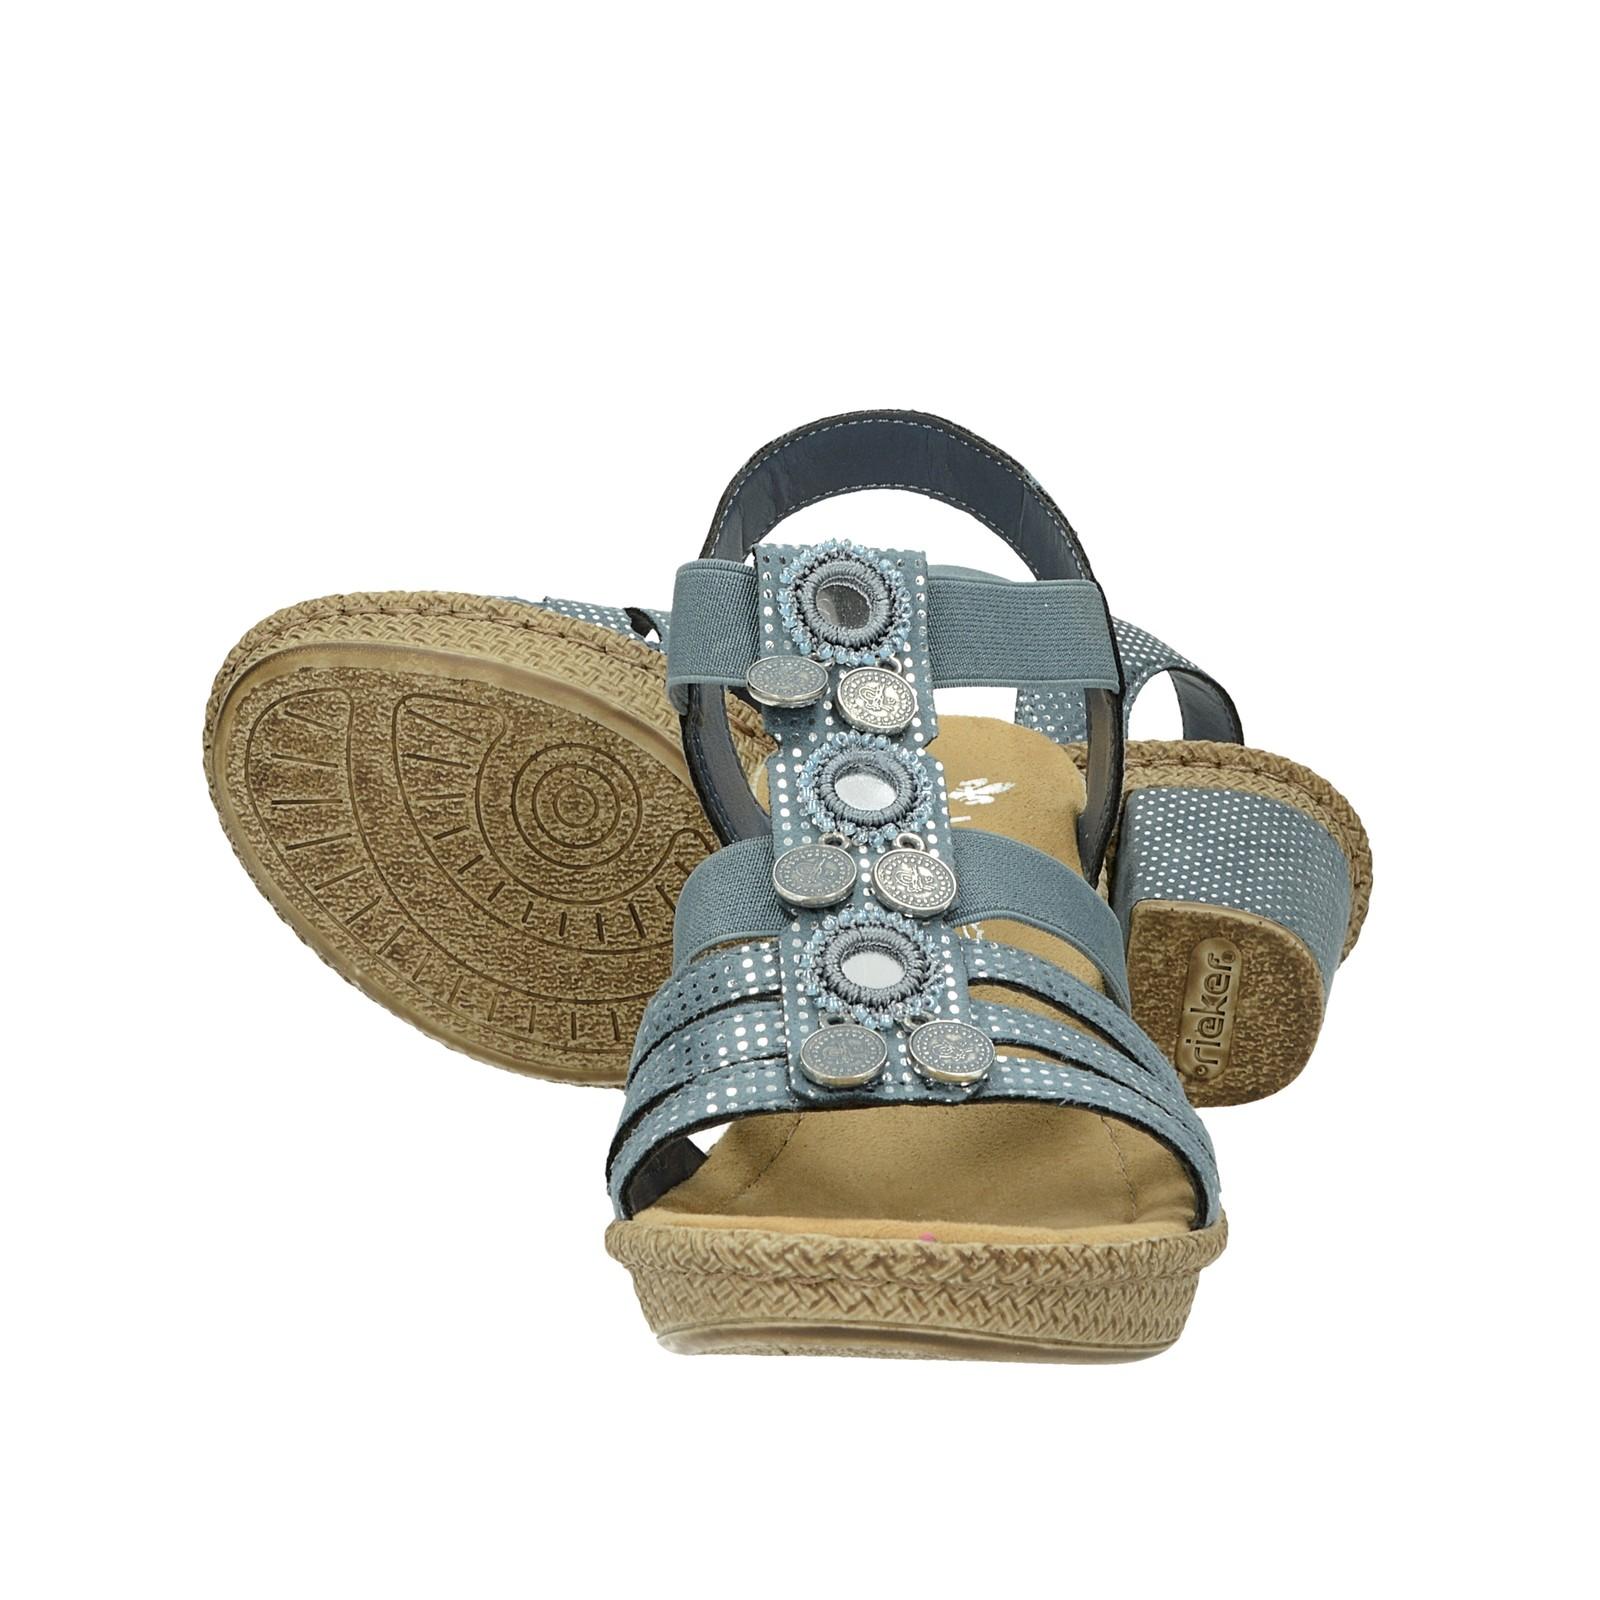 396d97c13f45f Rieker dámske štýlové sandále - modré | 6652712-BLU www.robel.sk